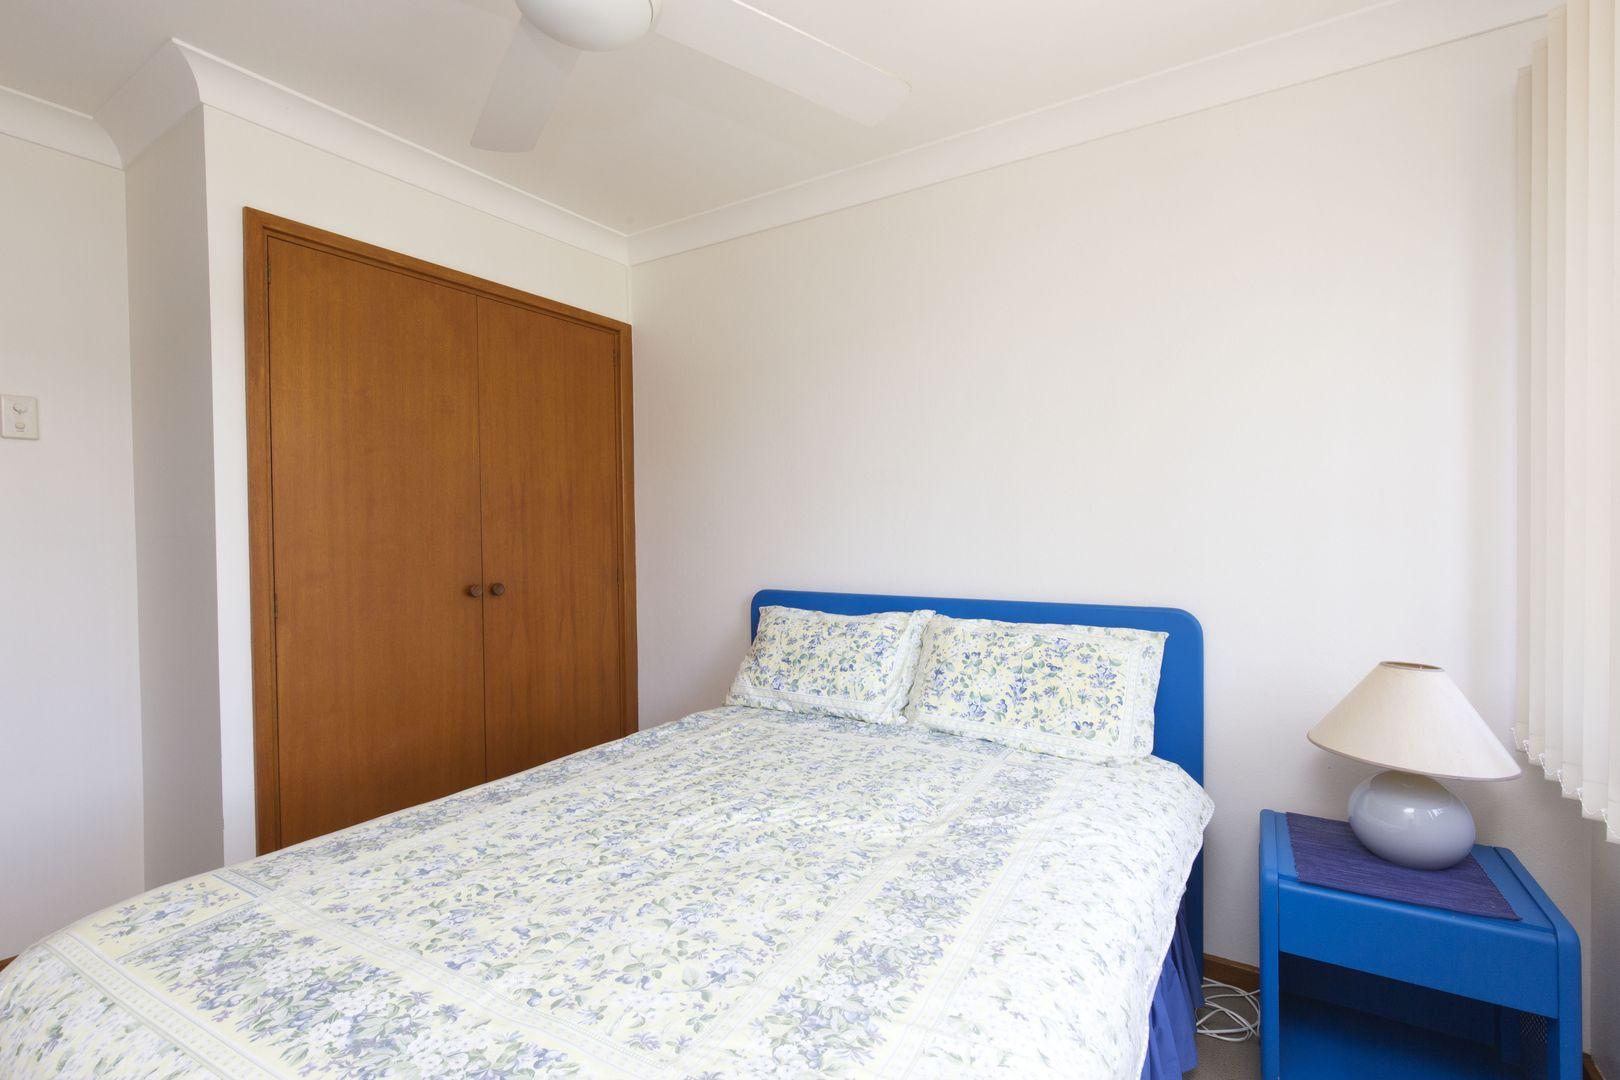 2/56 Mirreen Street, Hawks Nest NSW 2324, Image 2